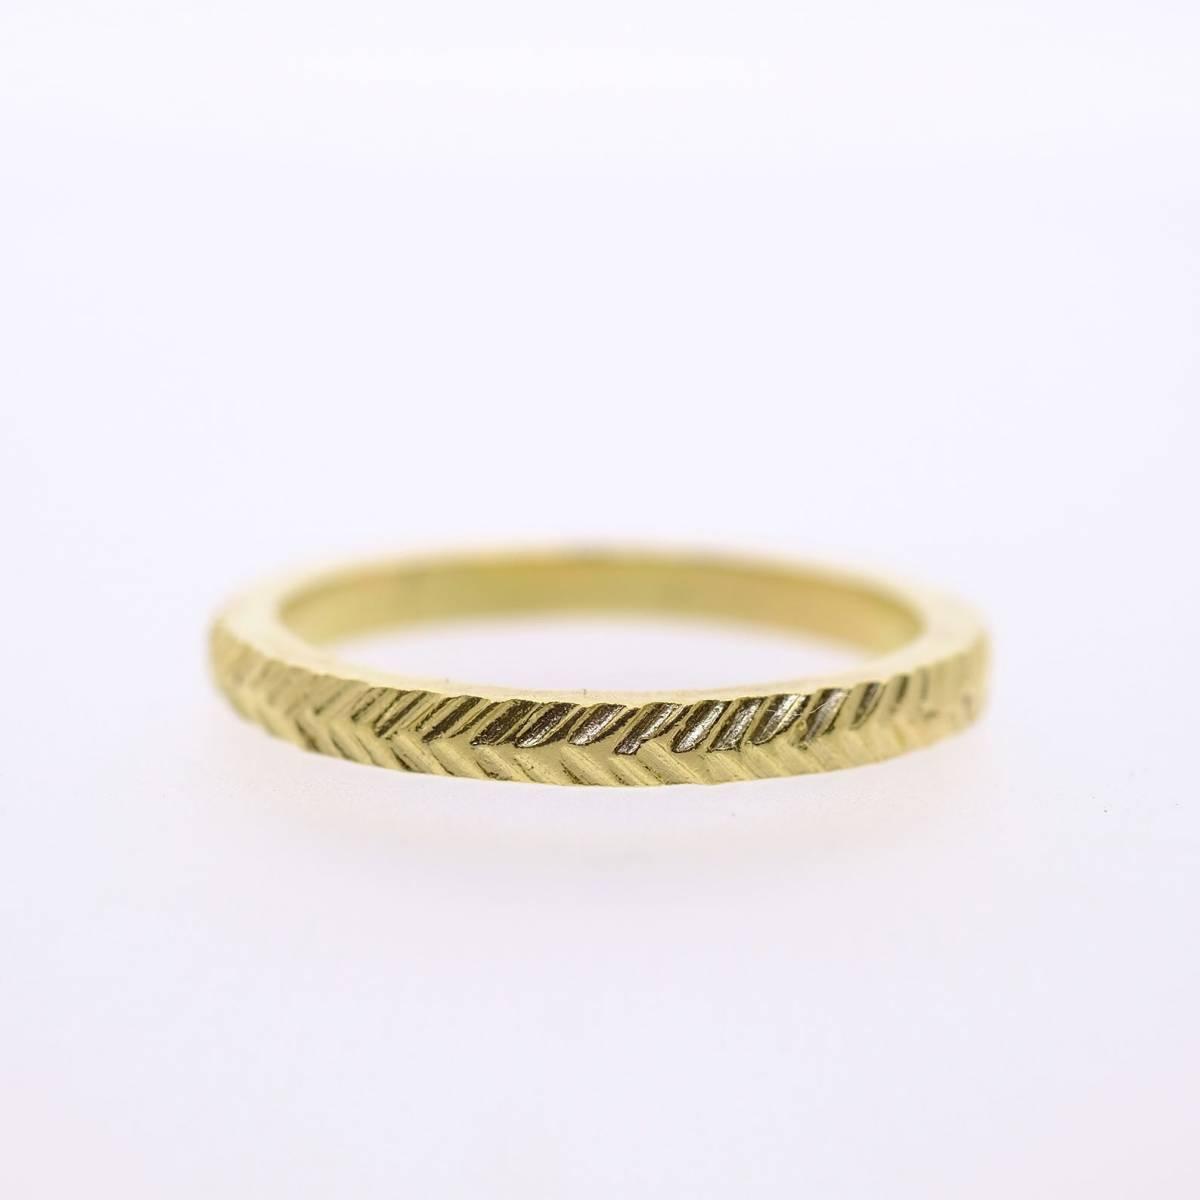 Jonas Maes Jewels - Juwelen - Bruidsjuwelen - Verlovingsring - Trouwring - House of Weddings - 8